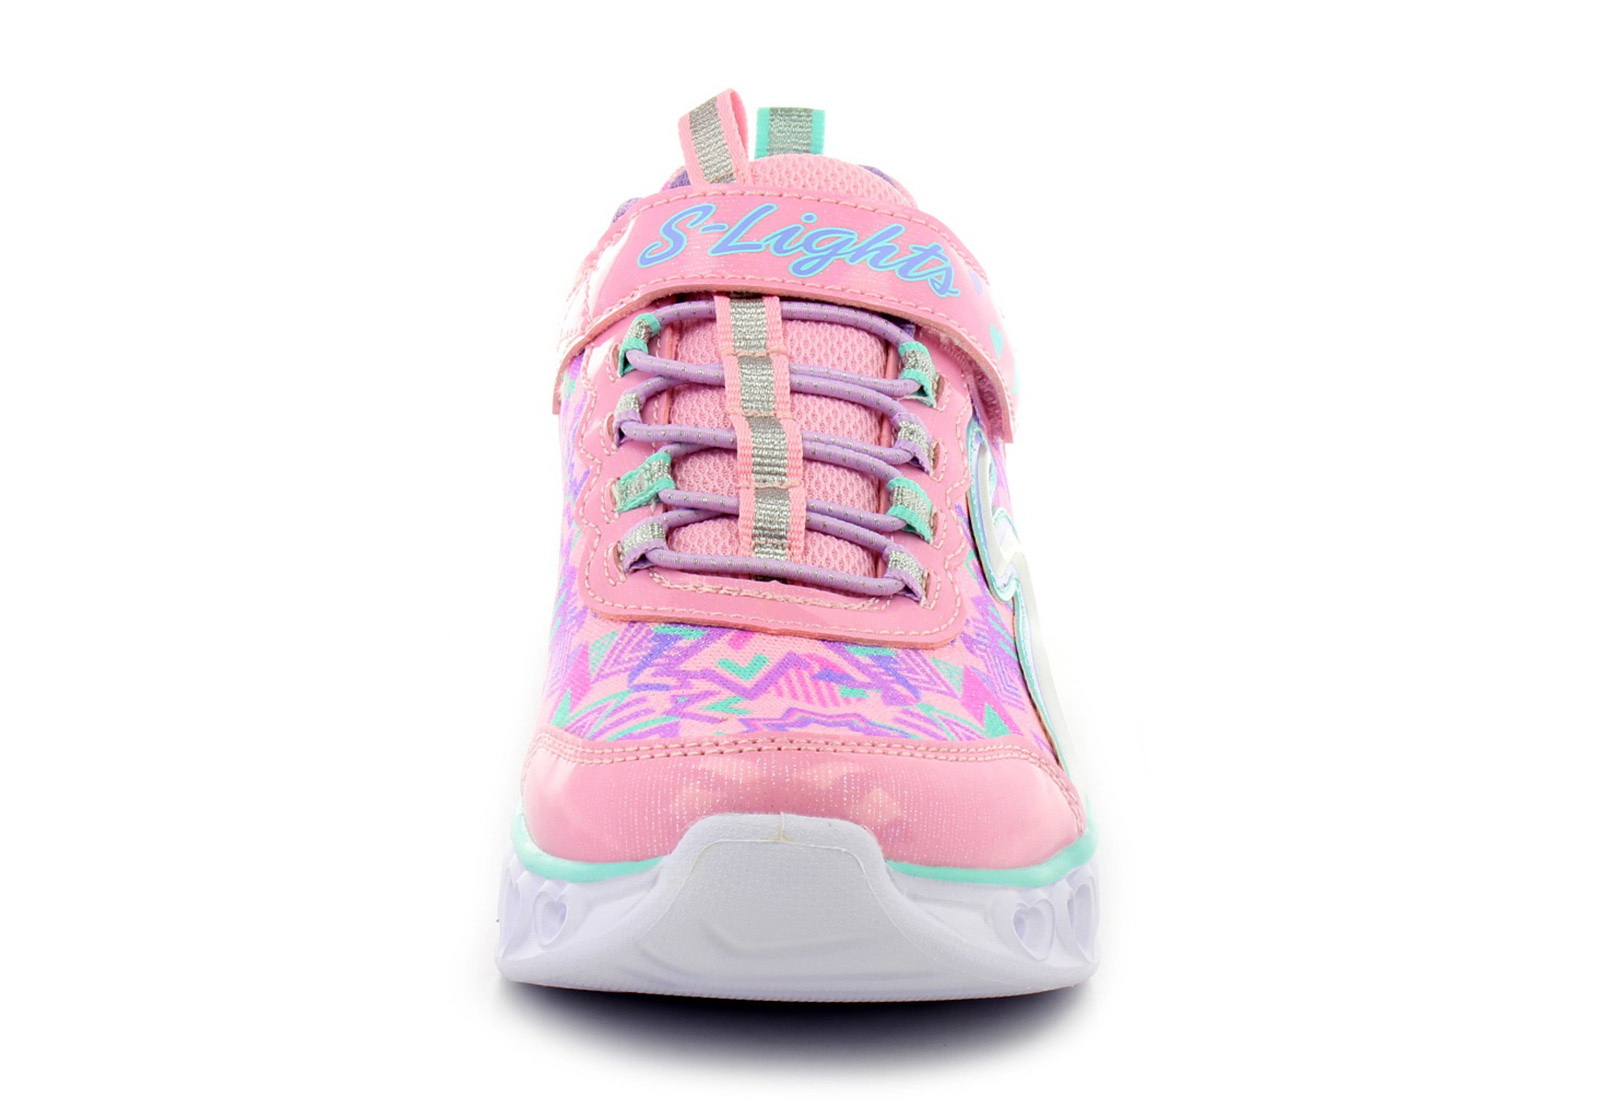 b1217be55d8f Skechers Cipő - Heart Lights - 20180L-lpmt - Office Shoes Magyarország